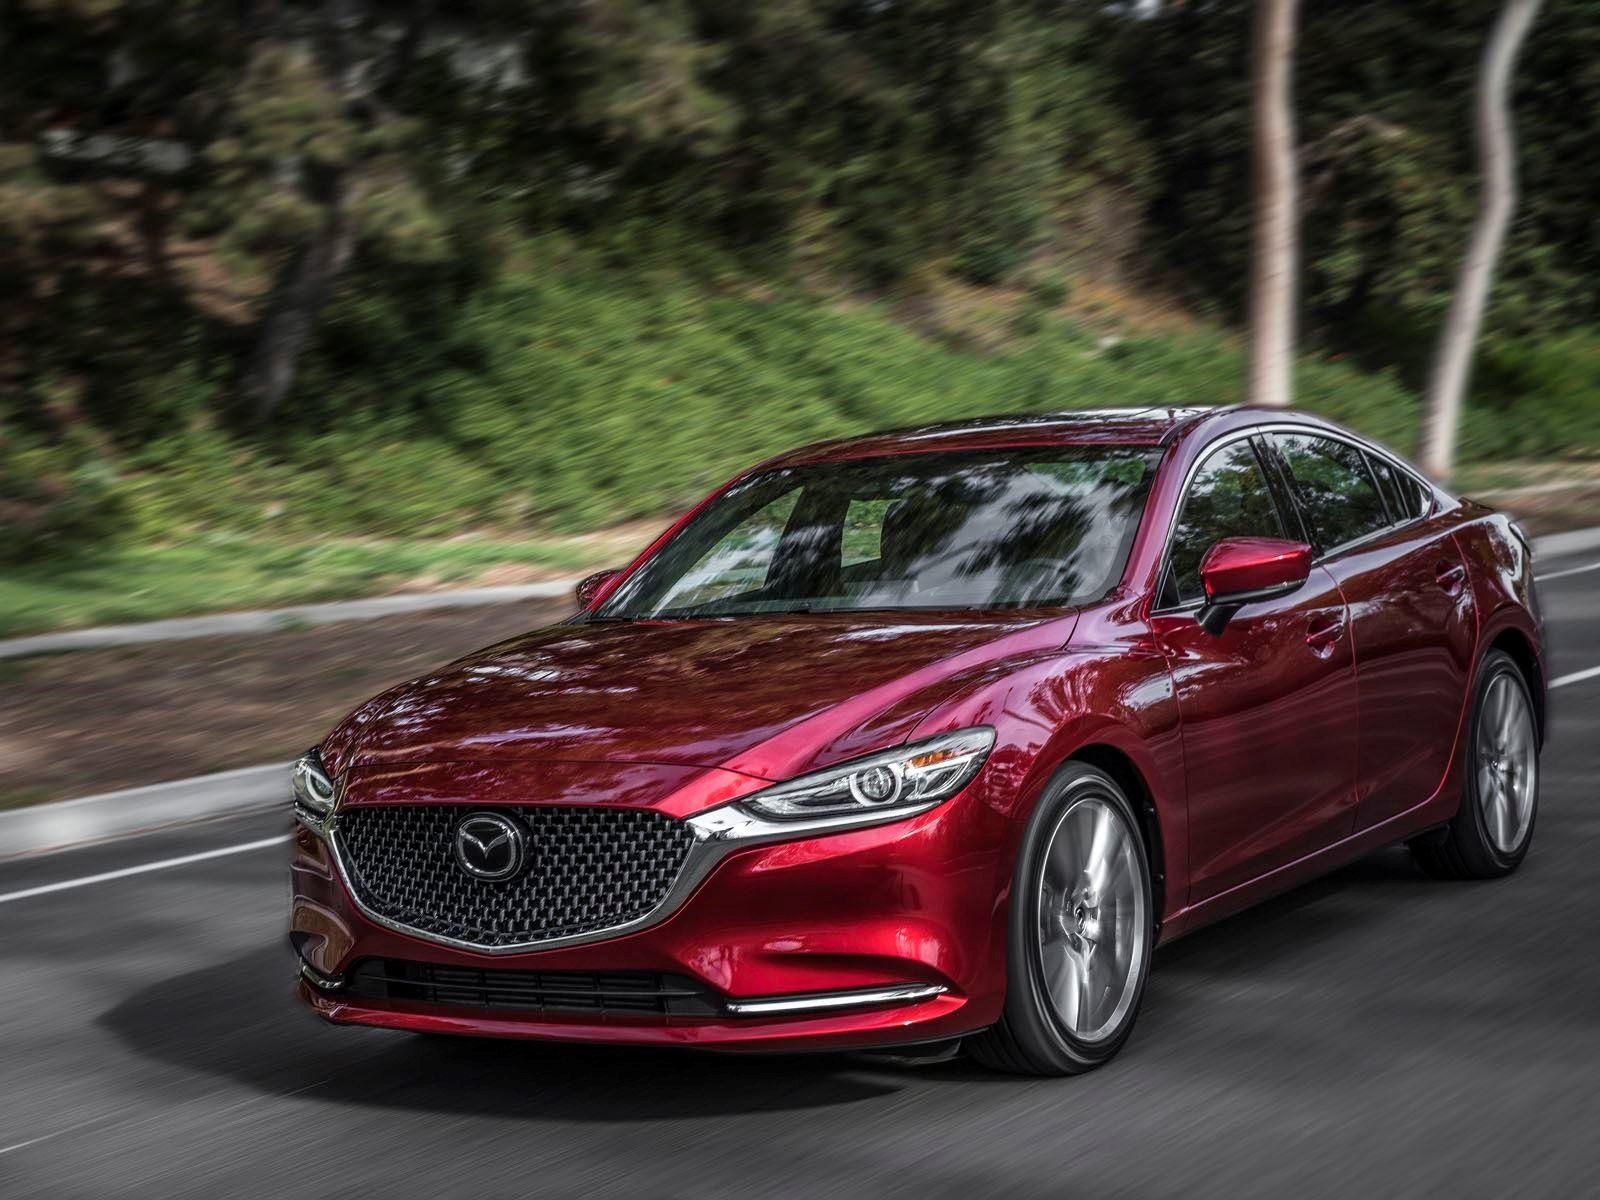 2020 Mazda 6 All Wheel Drive